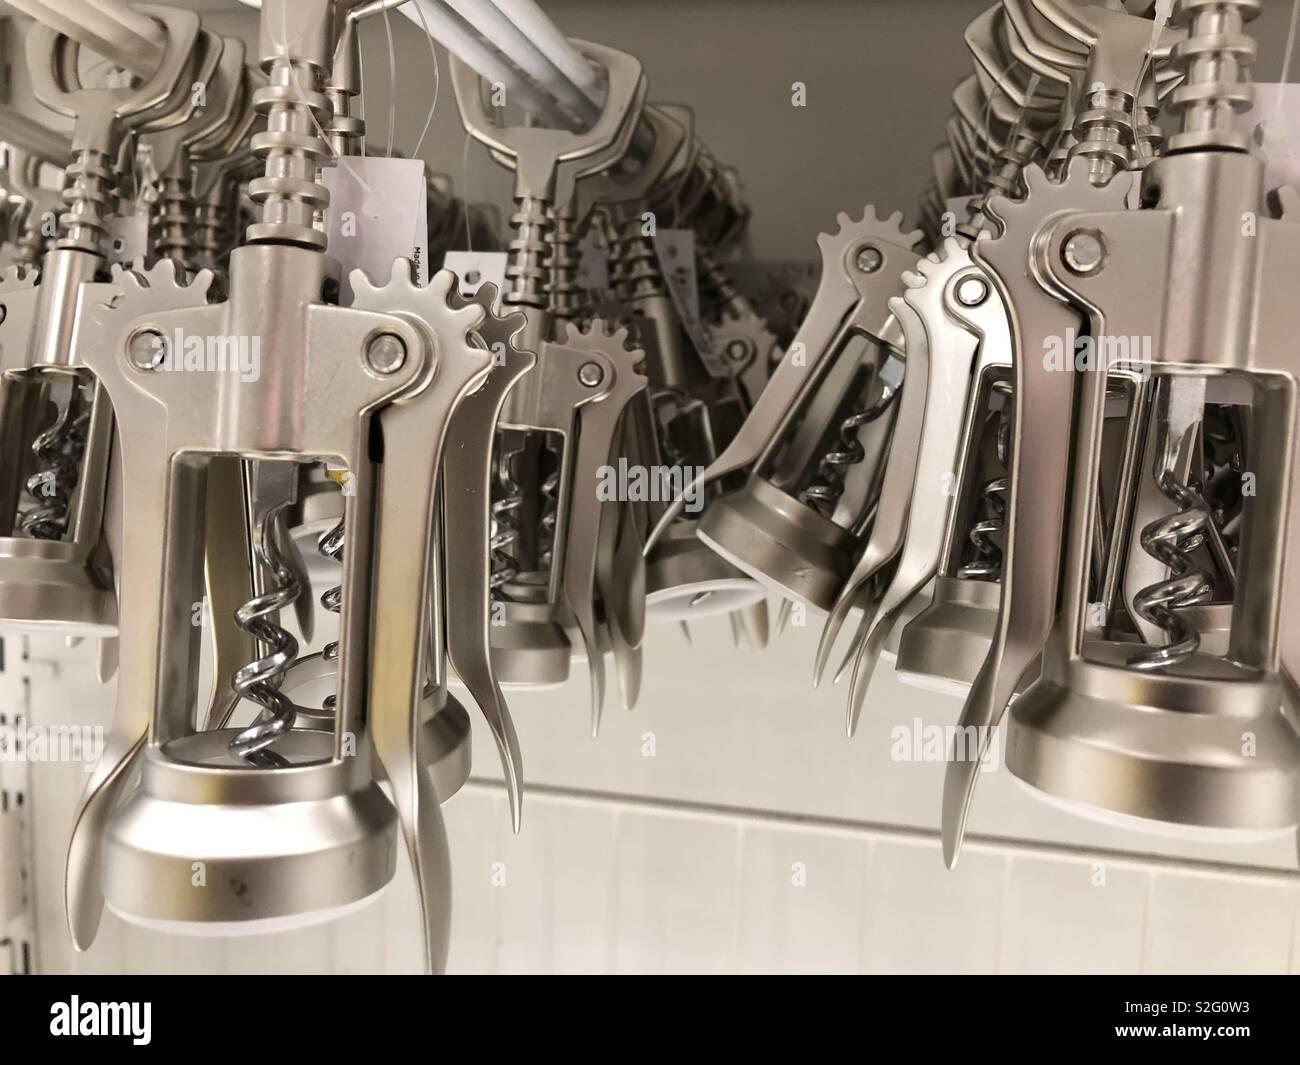 Corkscrew and bottle opener on display - Stock Image